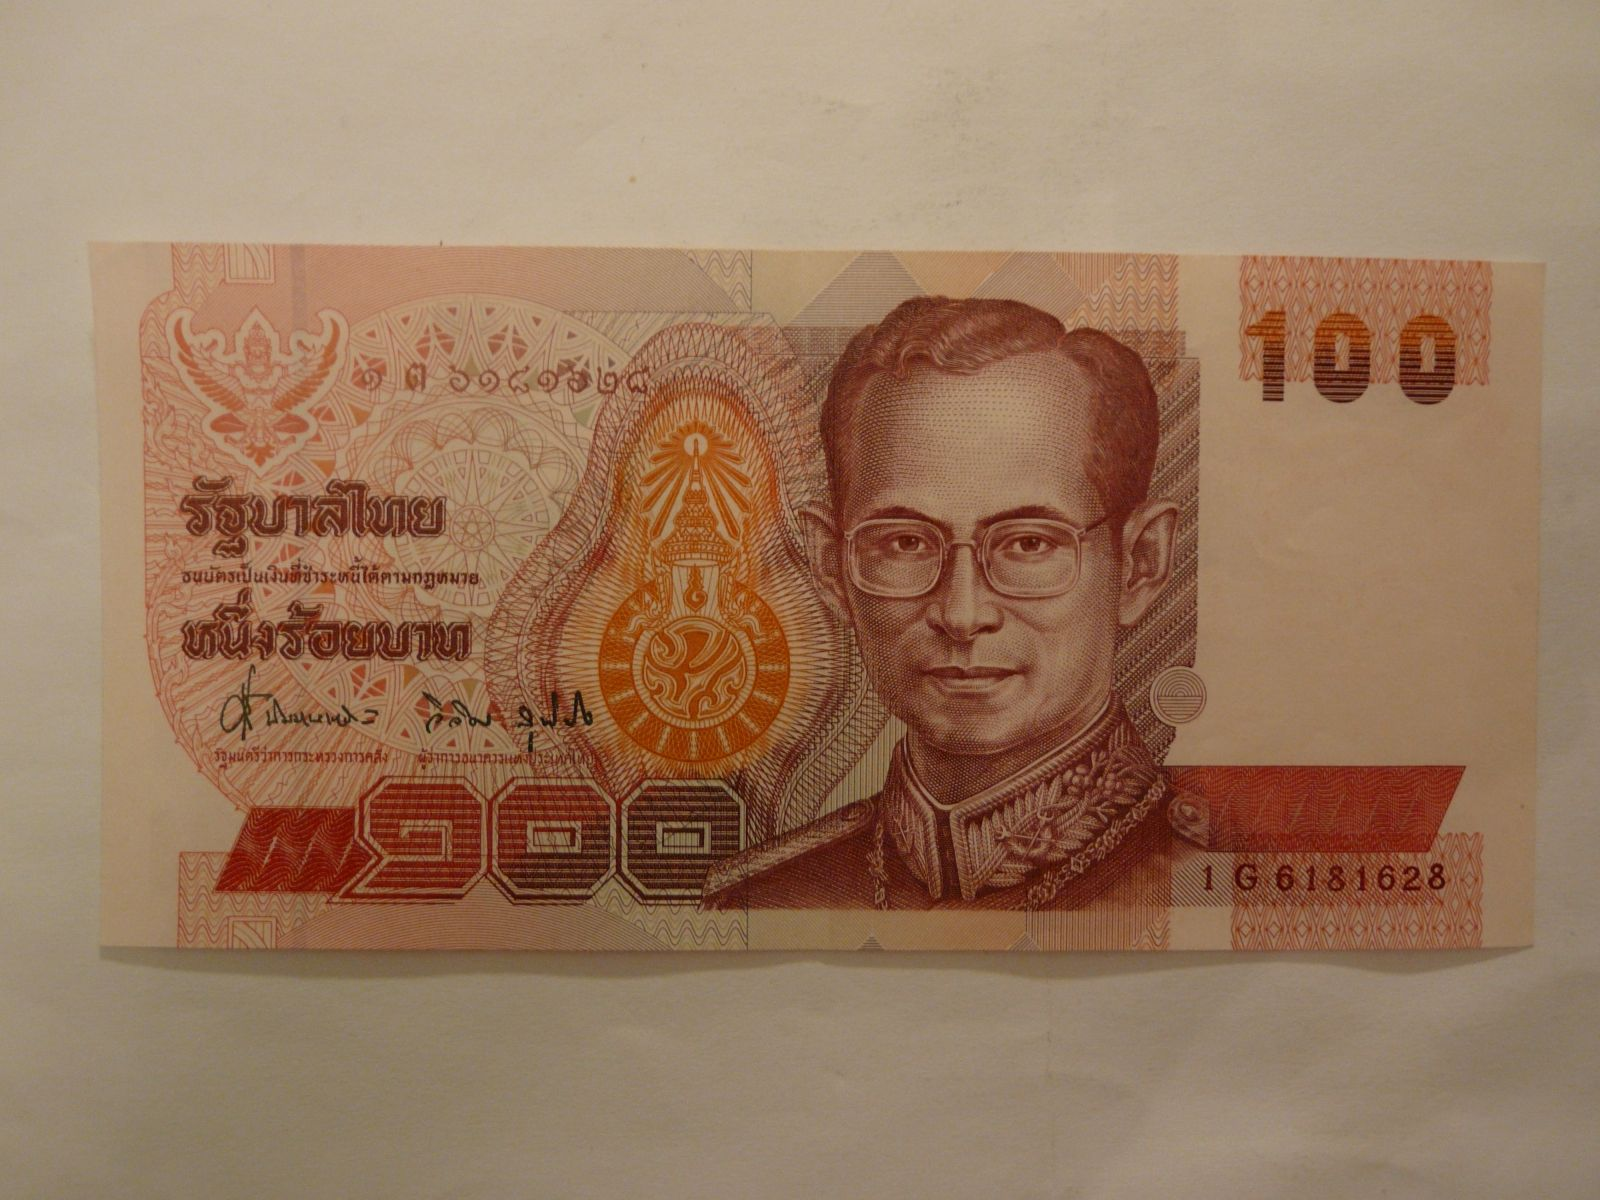 100 Bath, 1991, Thajskko